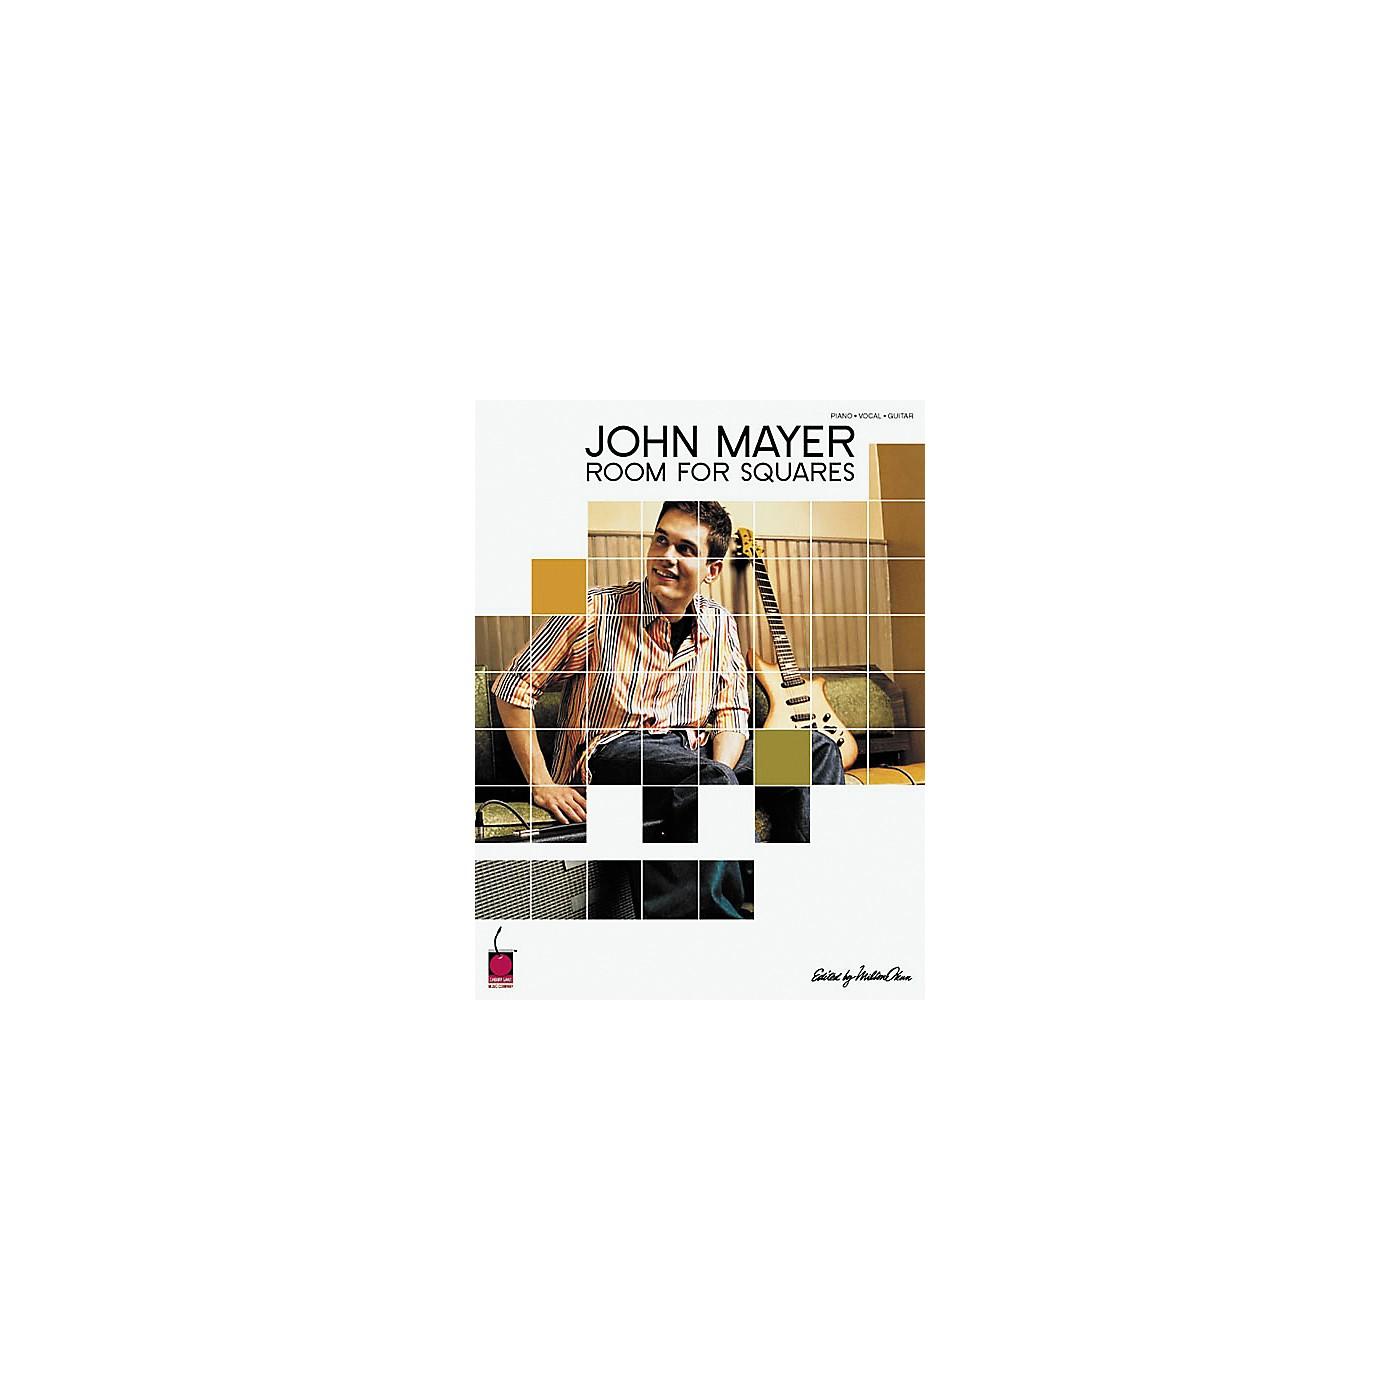 Hal Leonard John Mayer - Room for Squares Piano, Vocal, Guitar Songbook thumbnail